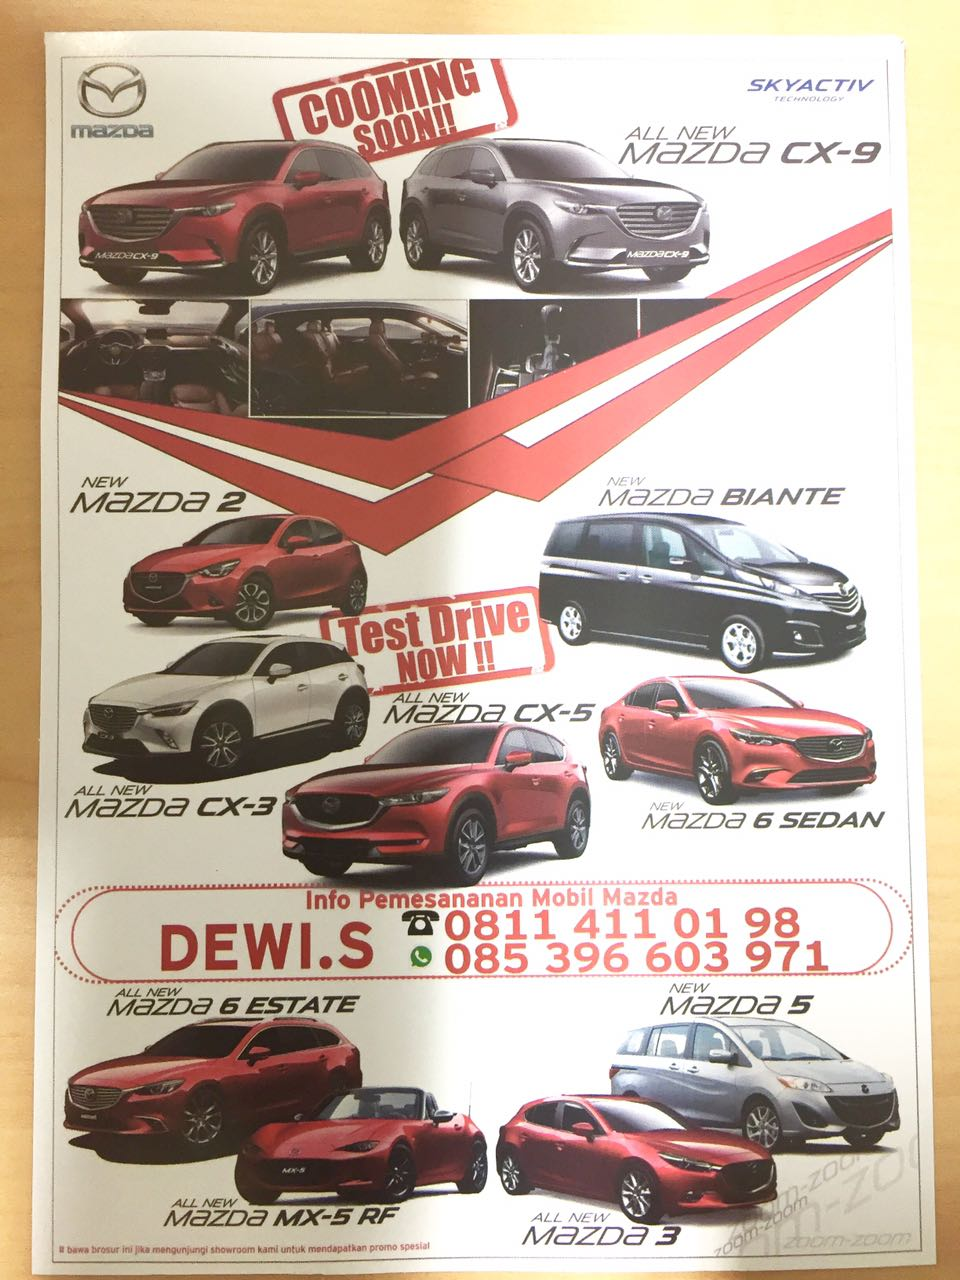 Promo Mazda Makassar 1 By Dewi